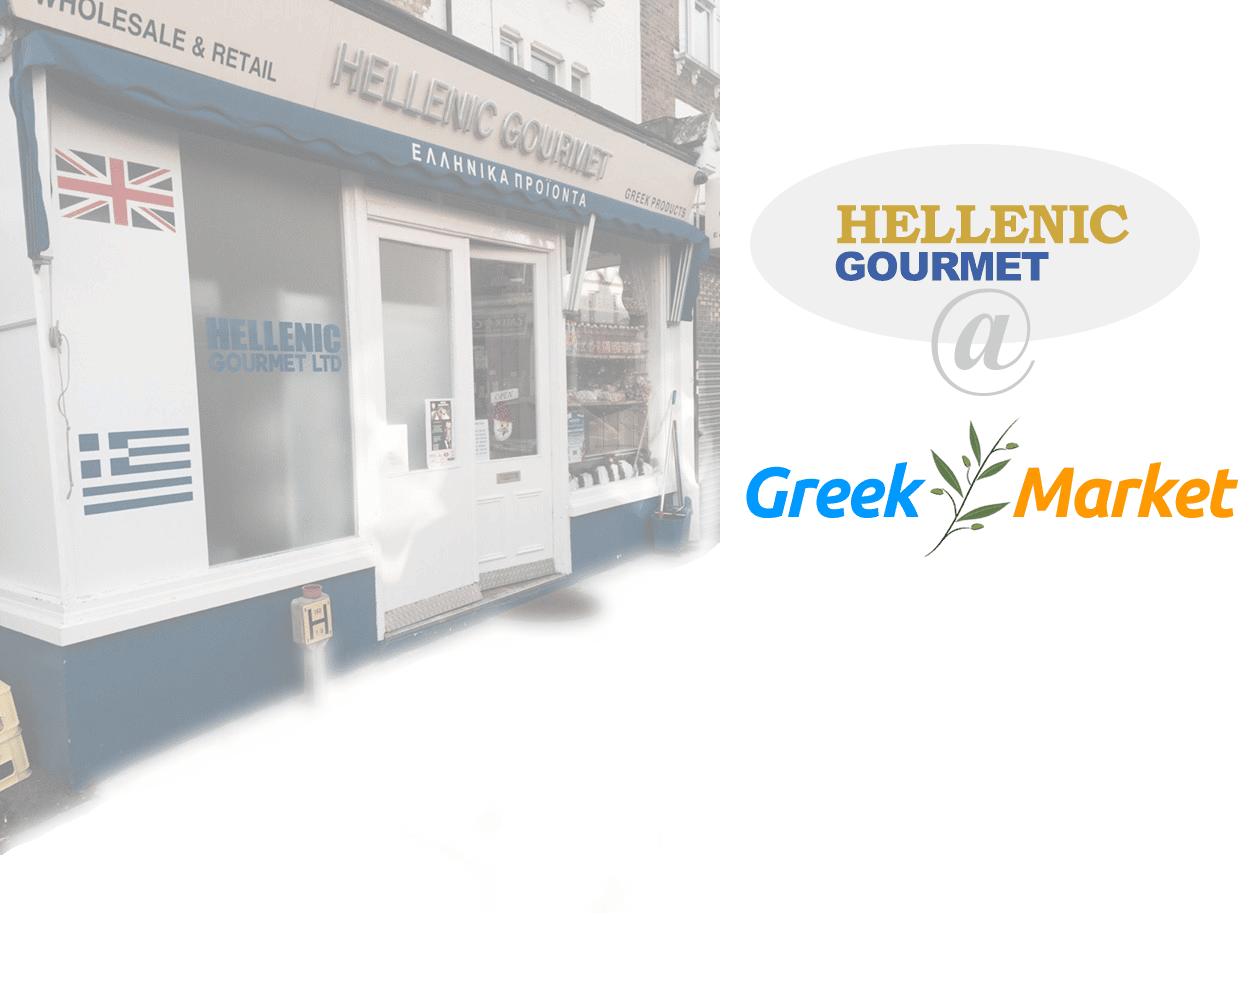 Hellenic Gourmet @ Greek Market